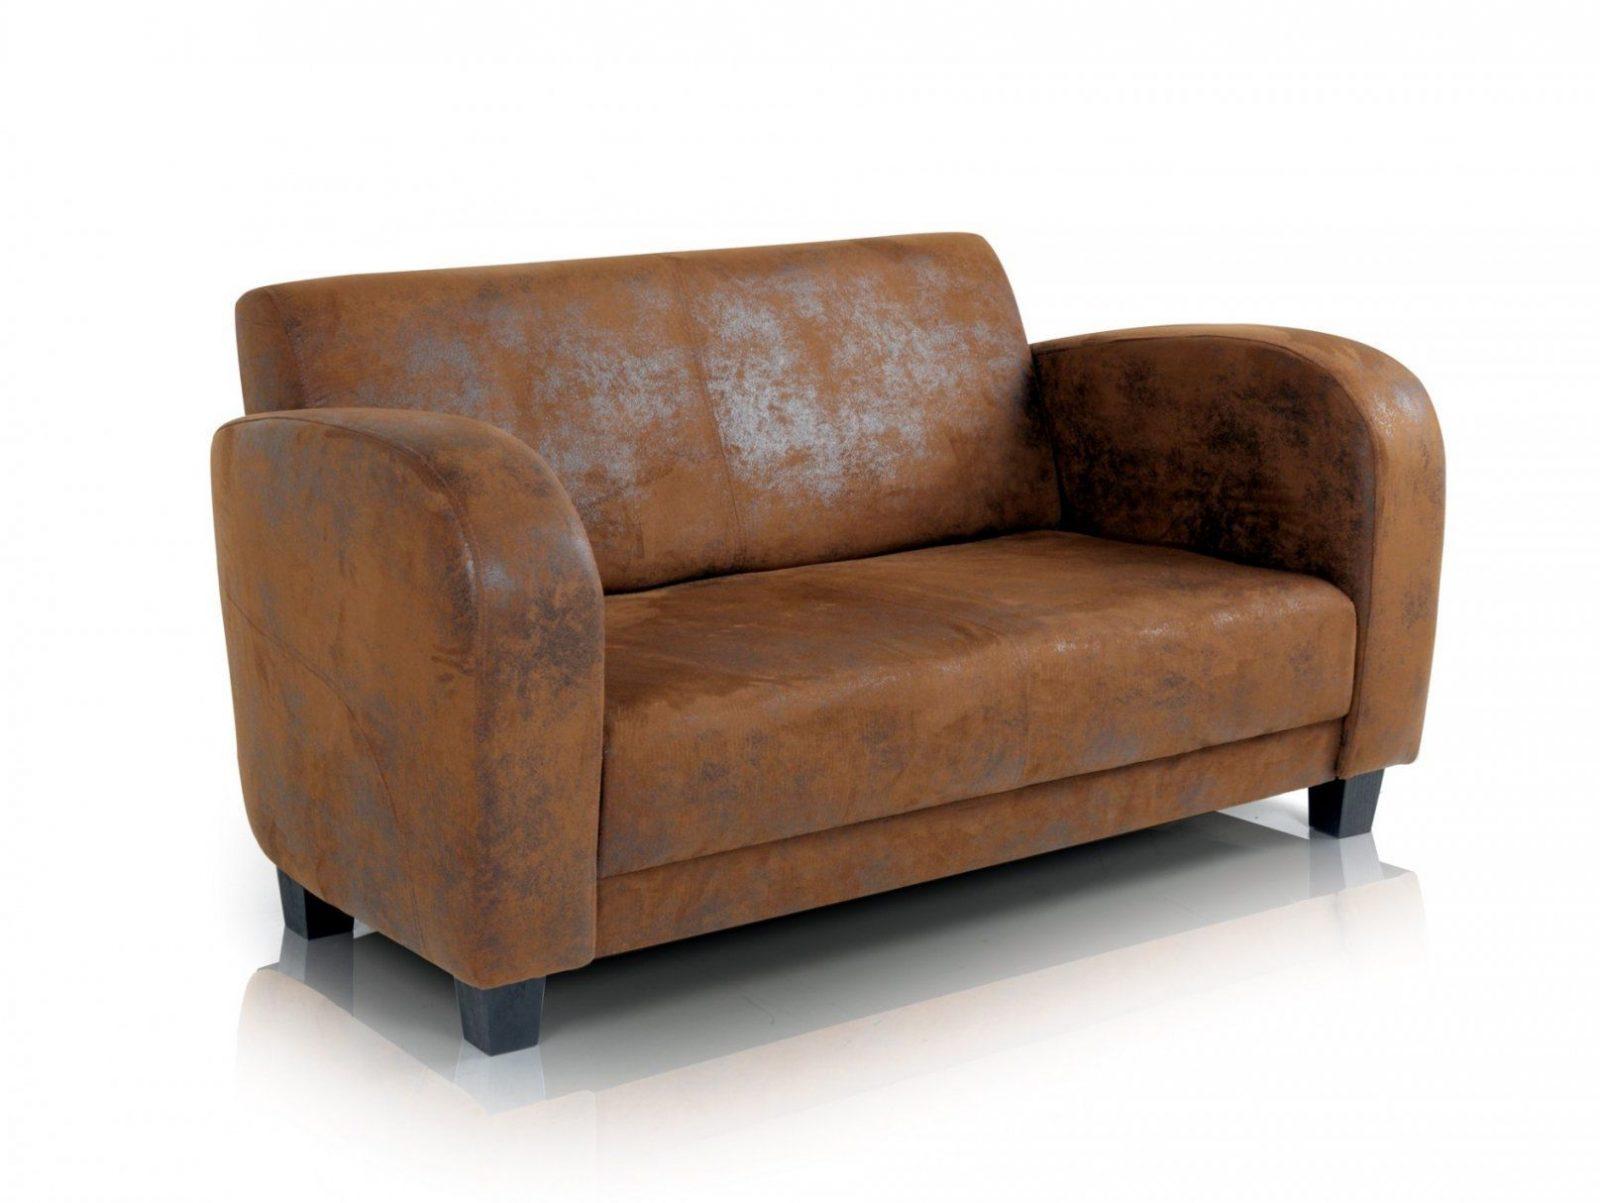 Wunderbar Anto Sofa 2 Sitzer Gobi Braun Zum Ledersofa 2 Sitzer von Ledersofa 2 Sitzer Braun Photo